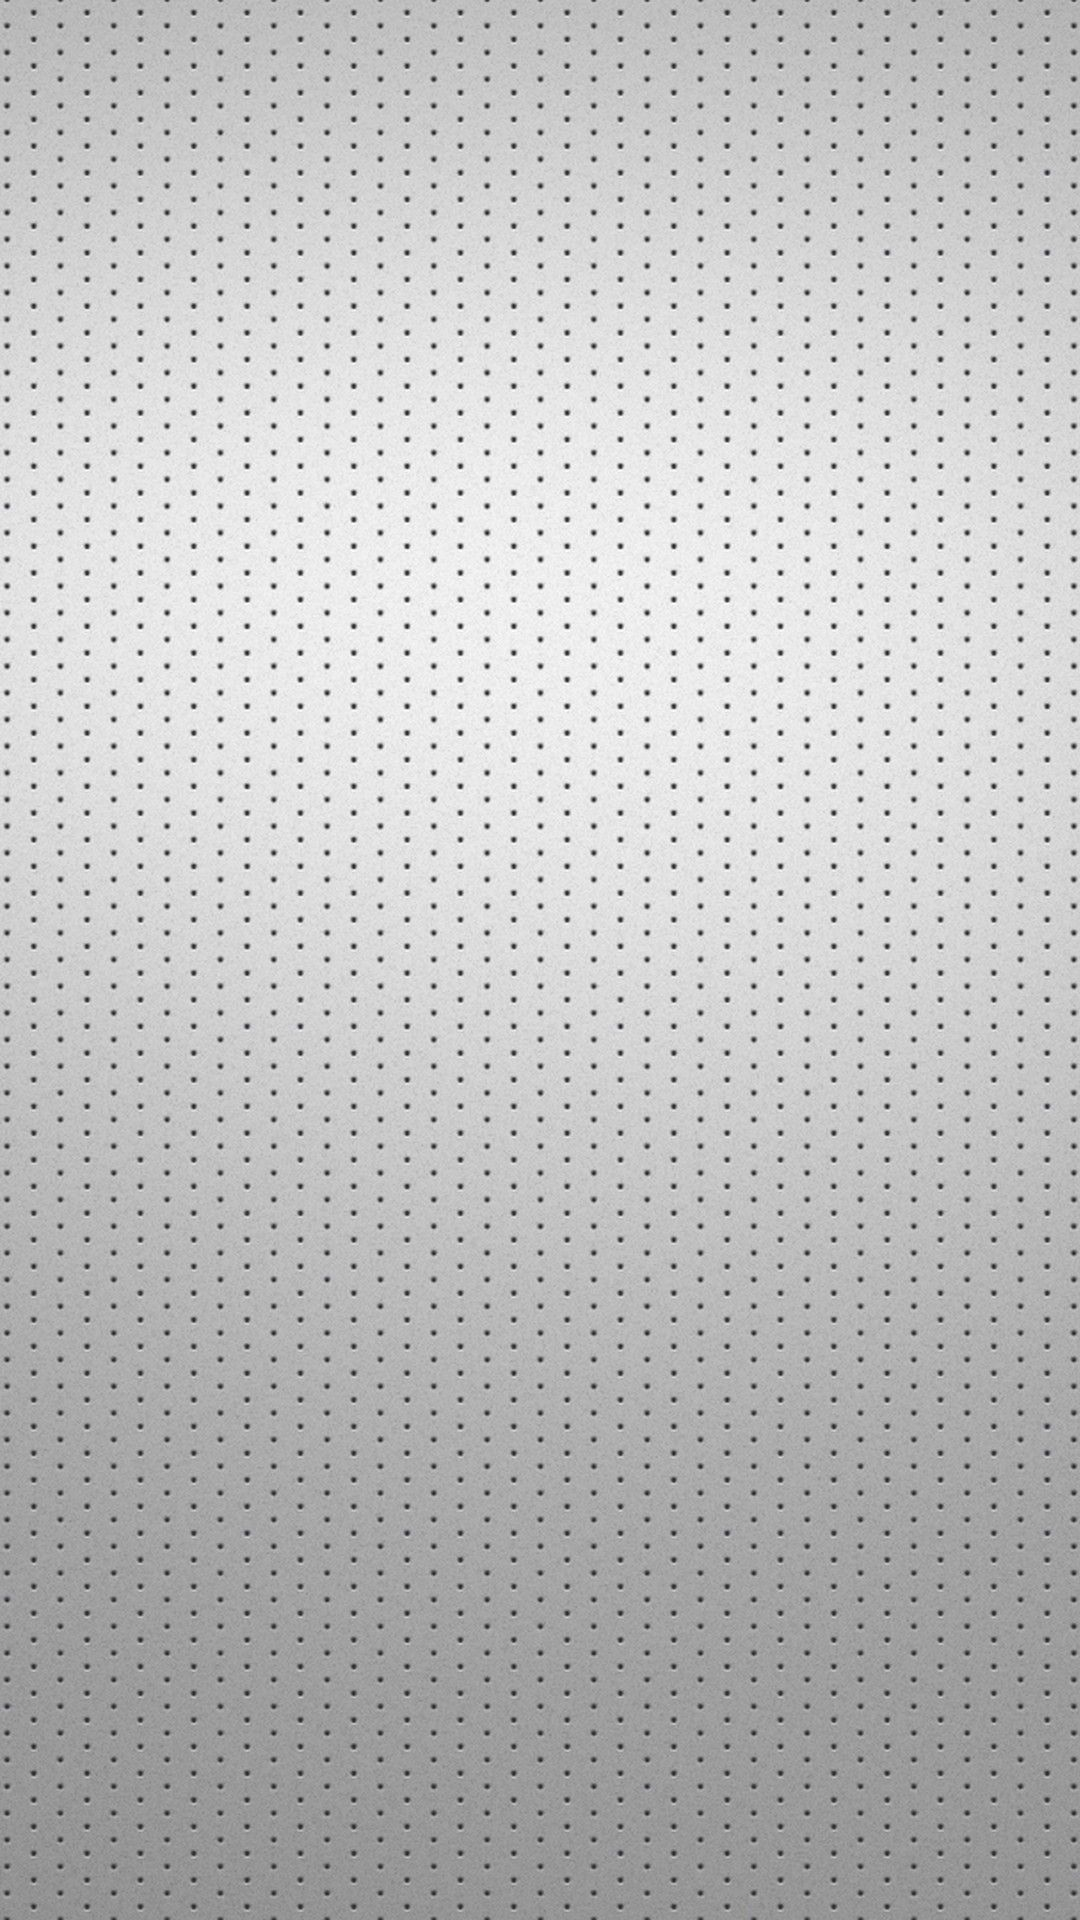 Wallpaper Silver iPhone Best iPhone Wallpaper Grey